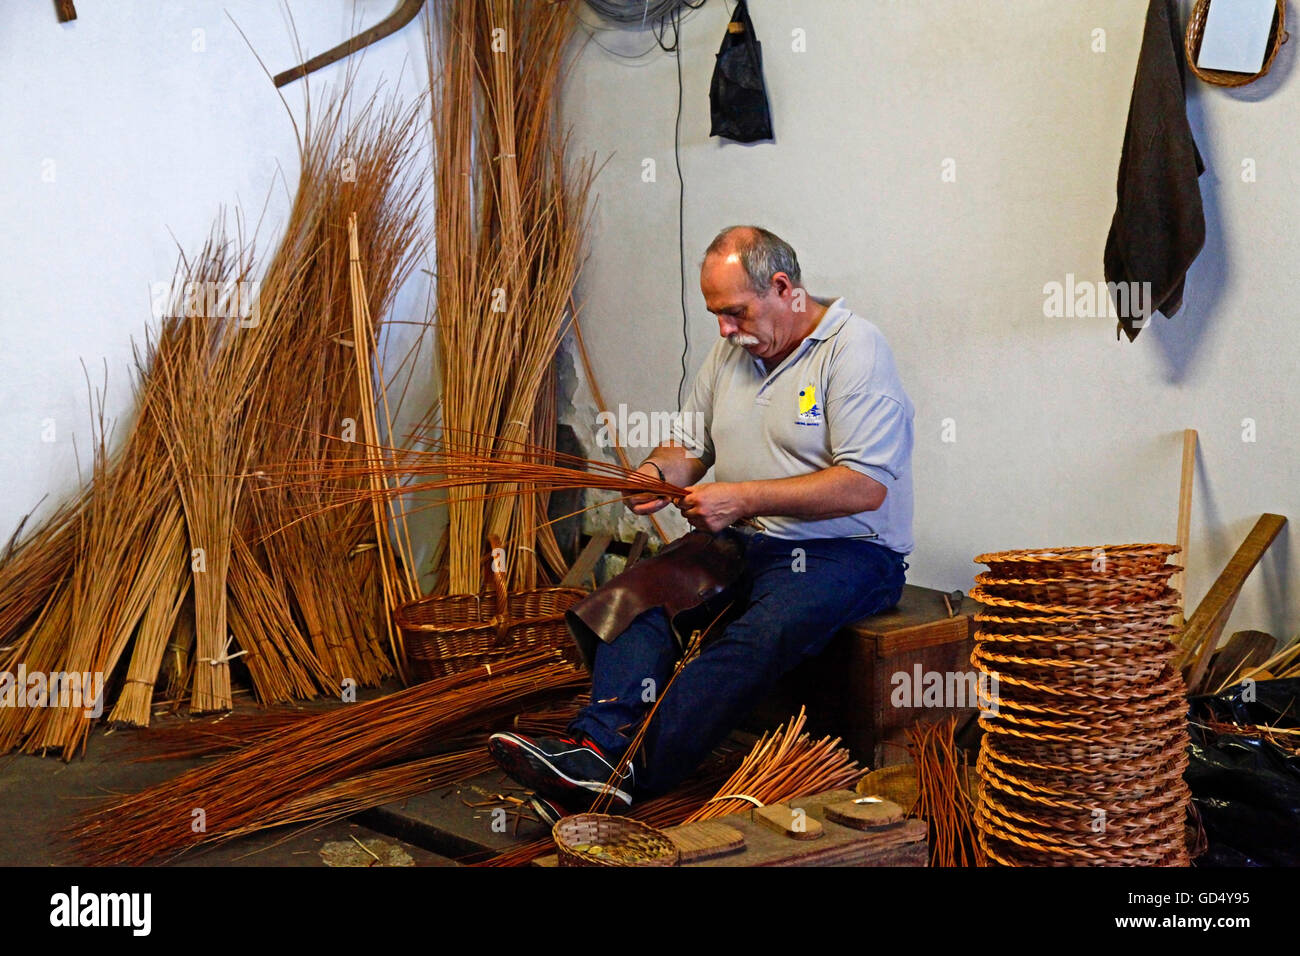 Basket-maker, Camacha, Island of Madeira, Portugal - Stock Image